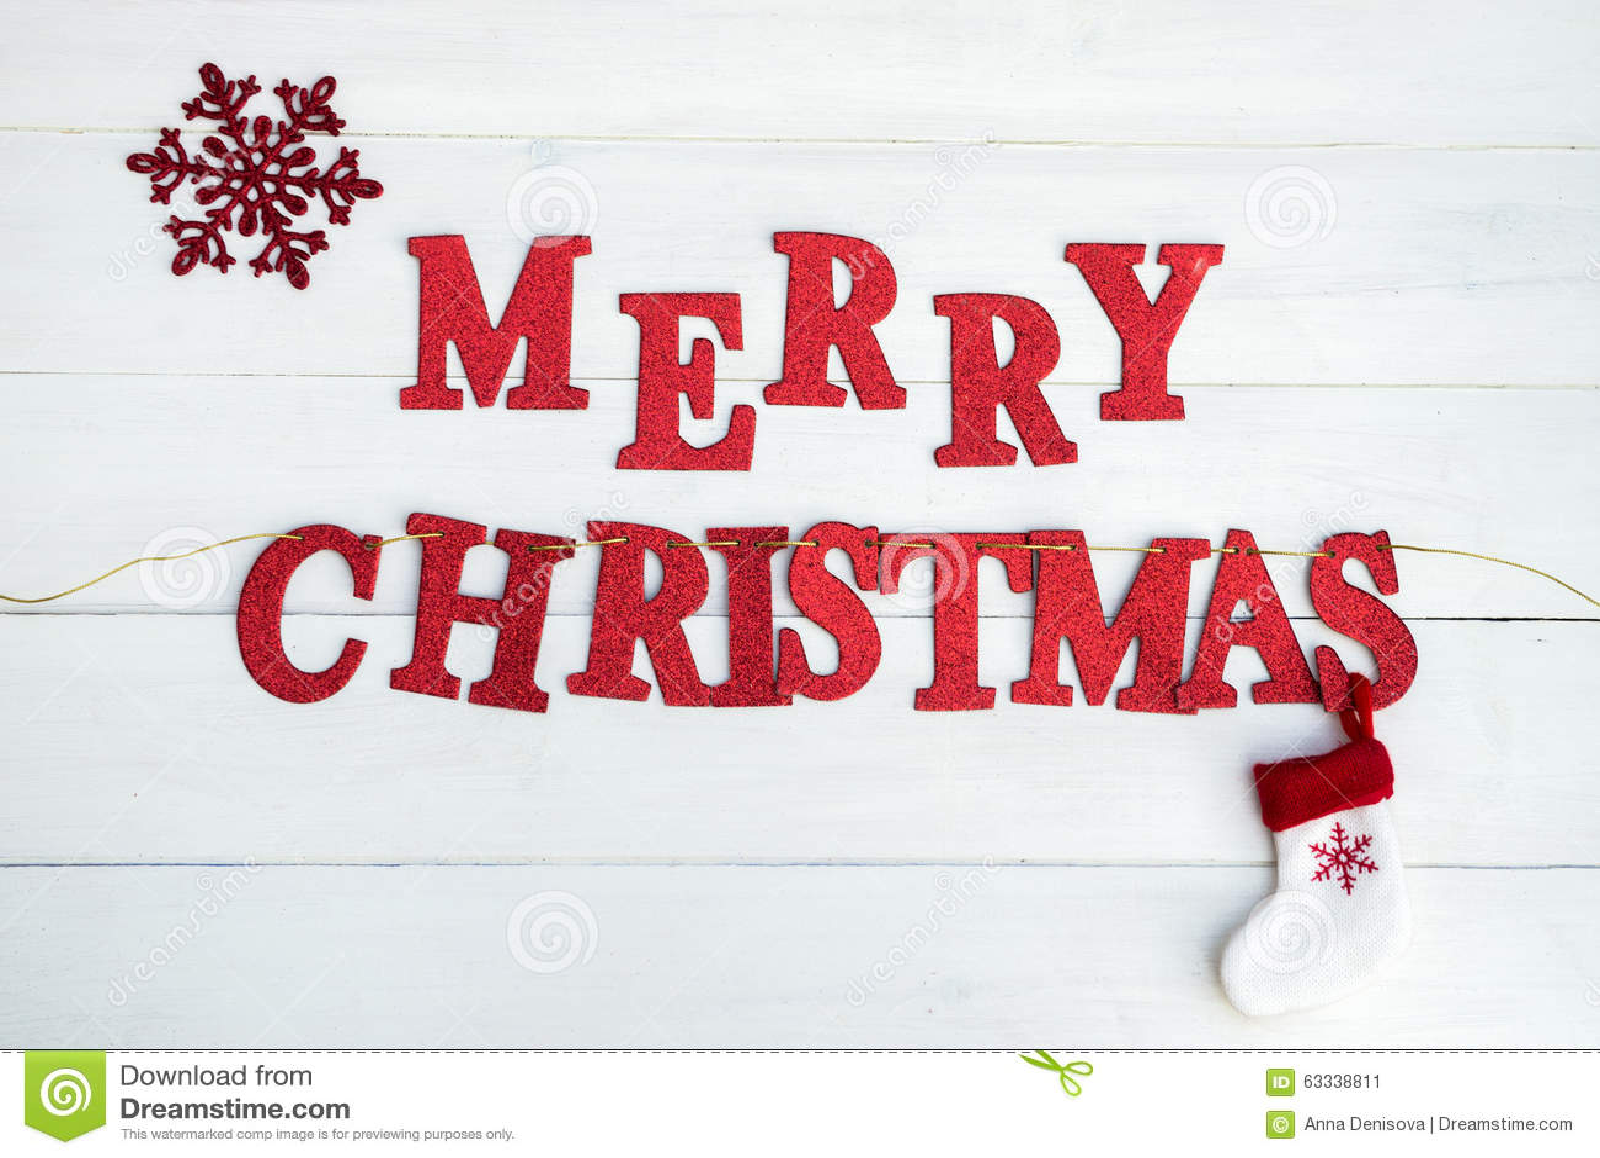 Words Merry Christmas Stock Photo